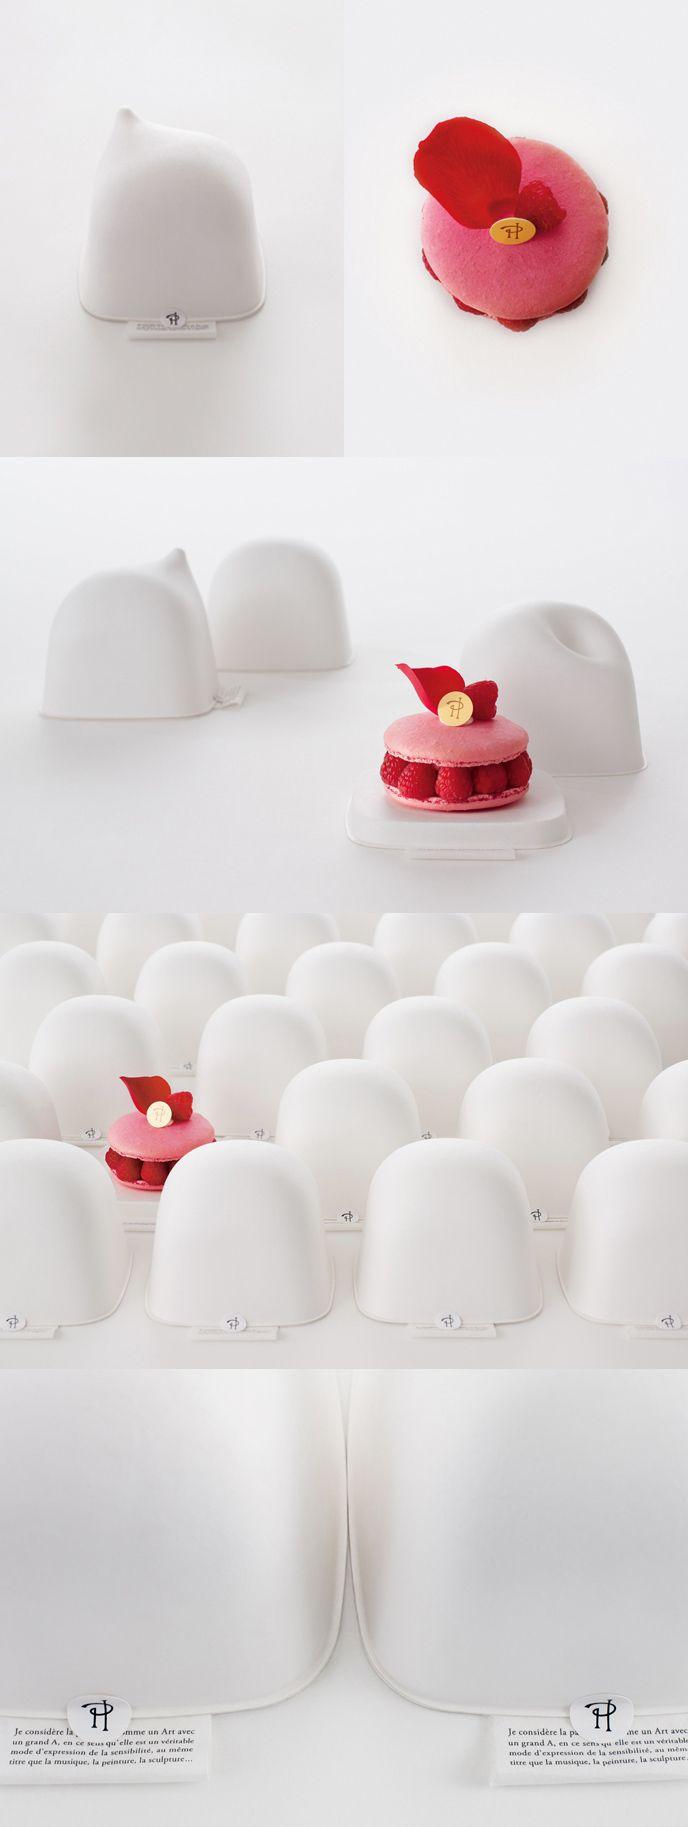 HARA Design Institute Pierre Herme Paris. When #packaging is art! PD